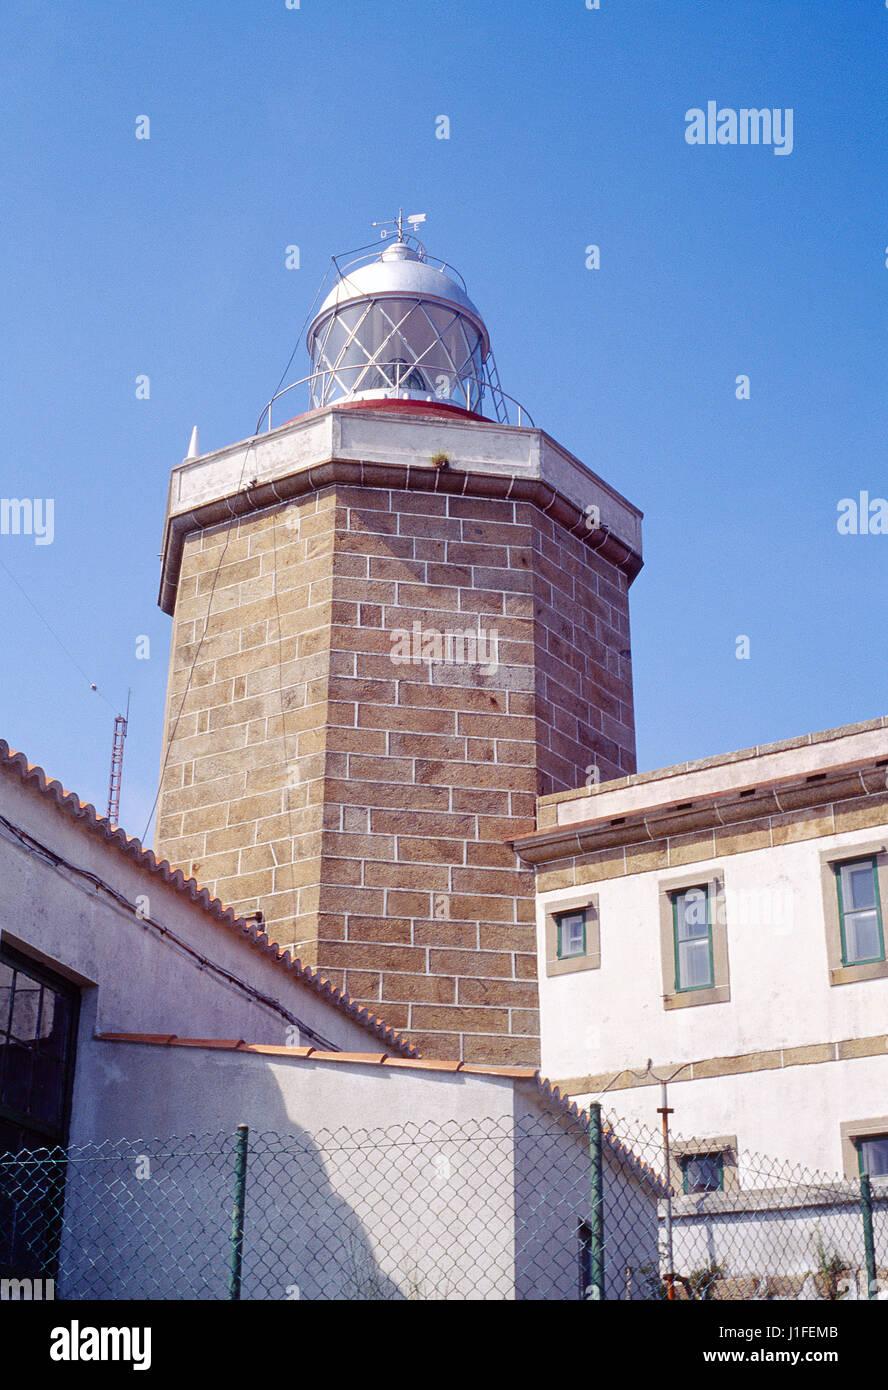 Lighthouse. Finisterre, La Coruña province, Galicia, Spain. - Stock Image